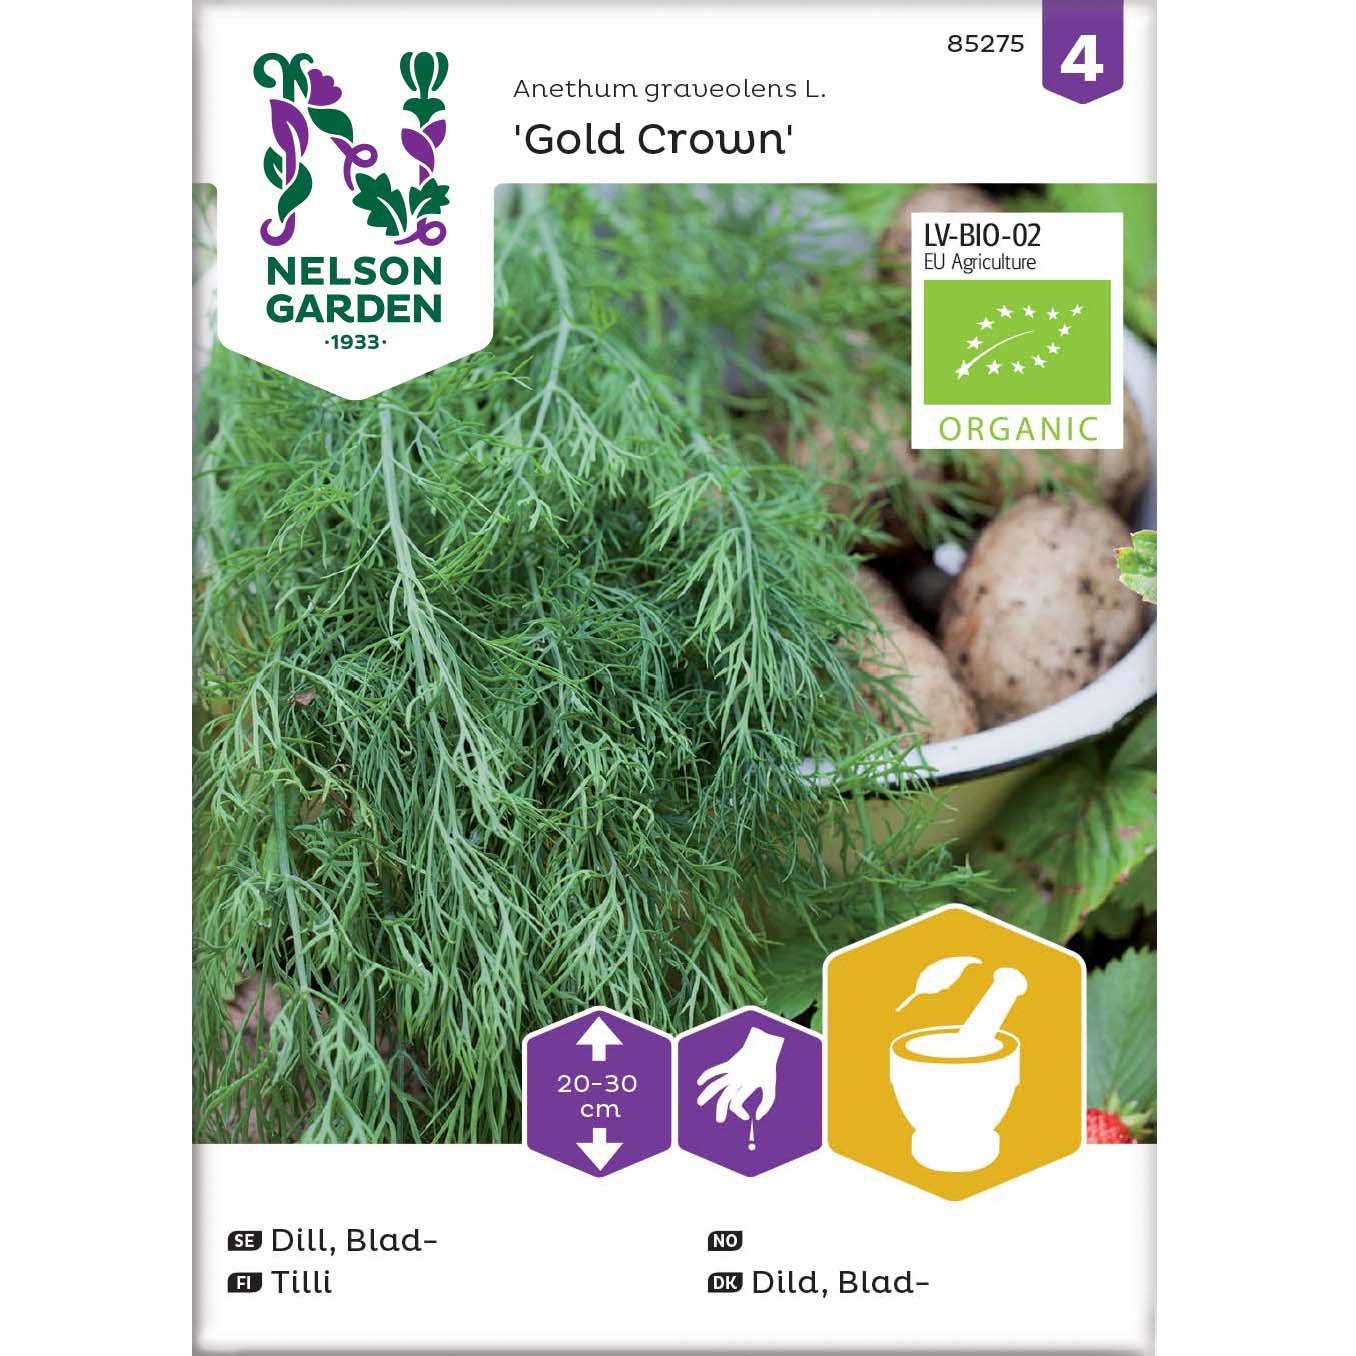 Dild, Blad-, Gold Crown, Organic